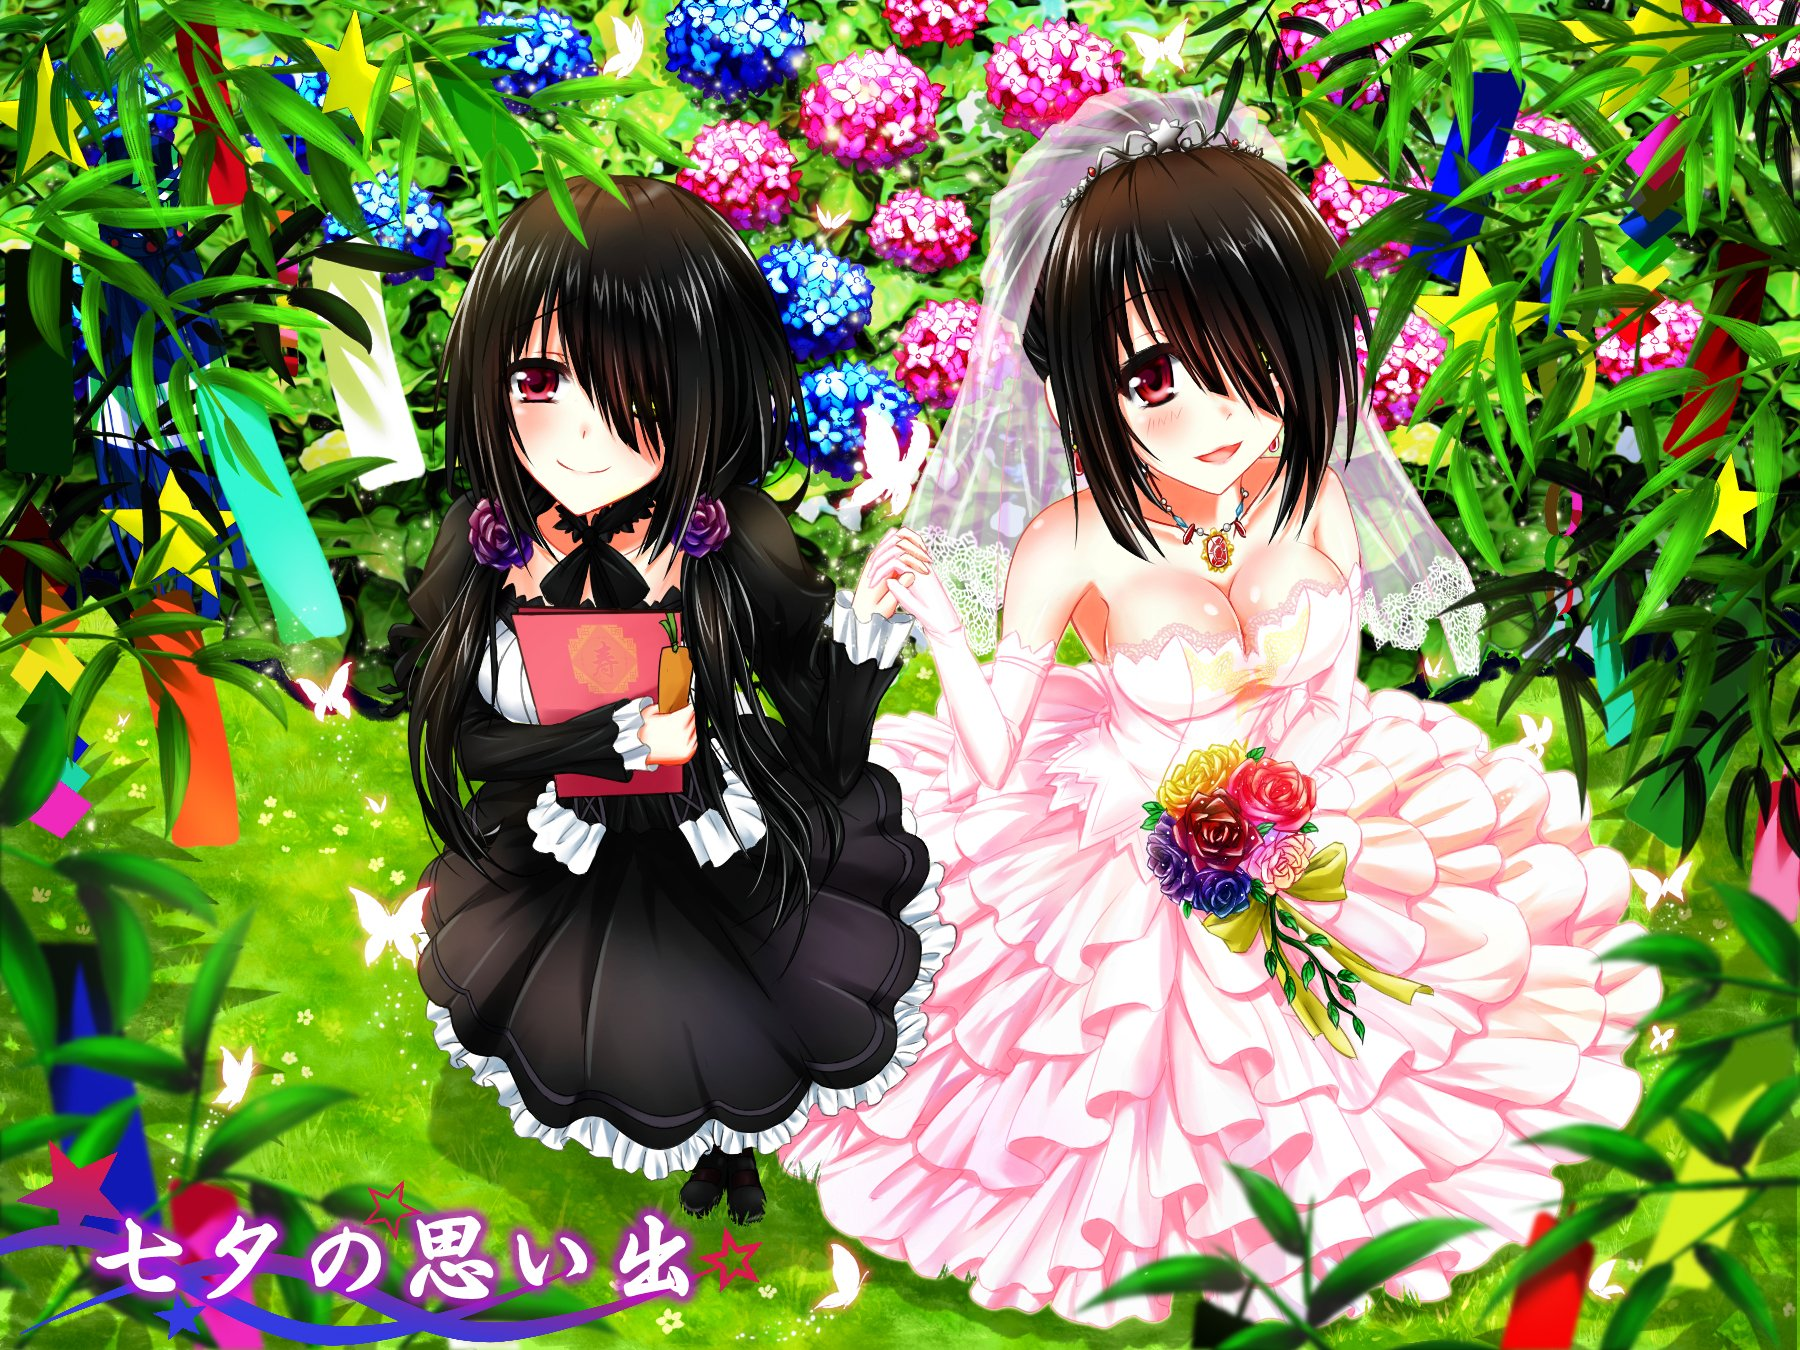 Aliasing Date A Live Flowers Goth Loli Tokisaki Kurumi Tsubasaki